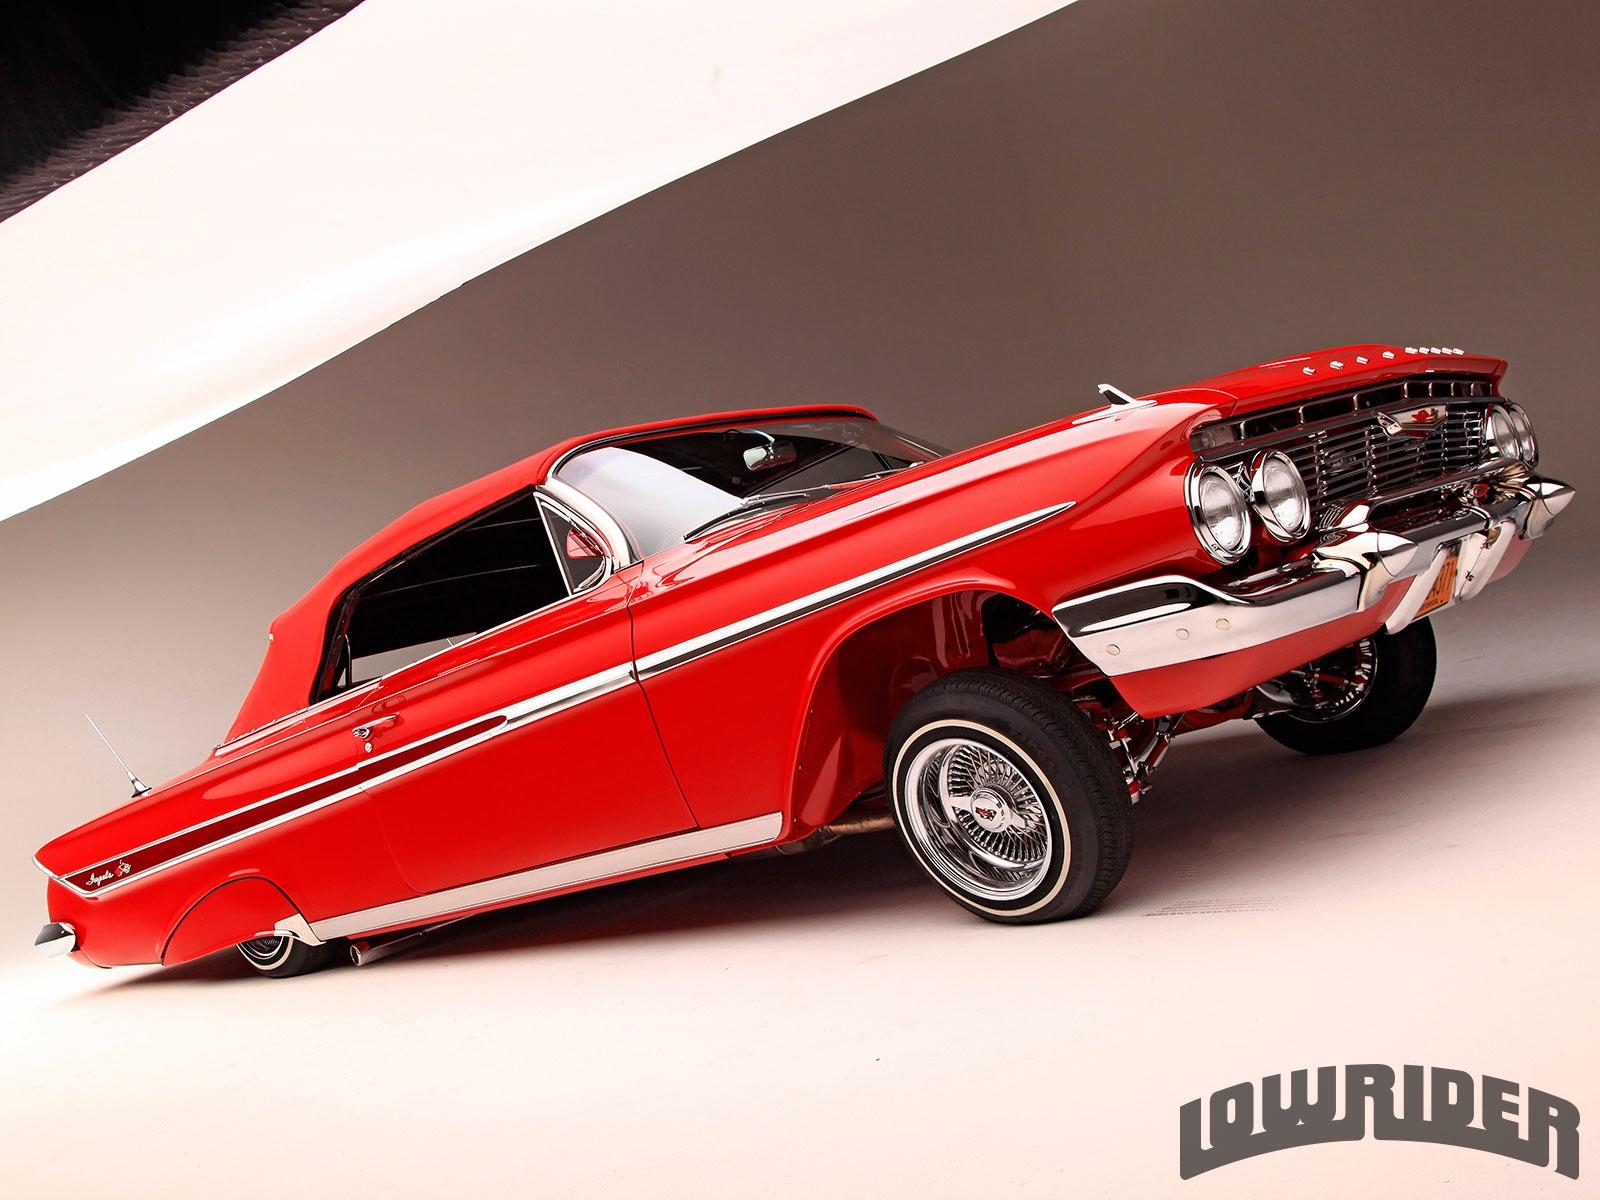 1961 Chevrolet Impala Nyc Rotten Apple Lowrider Magazine